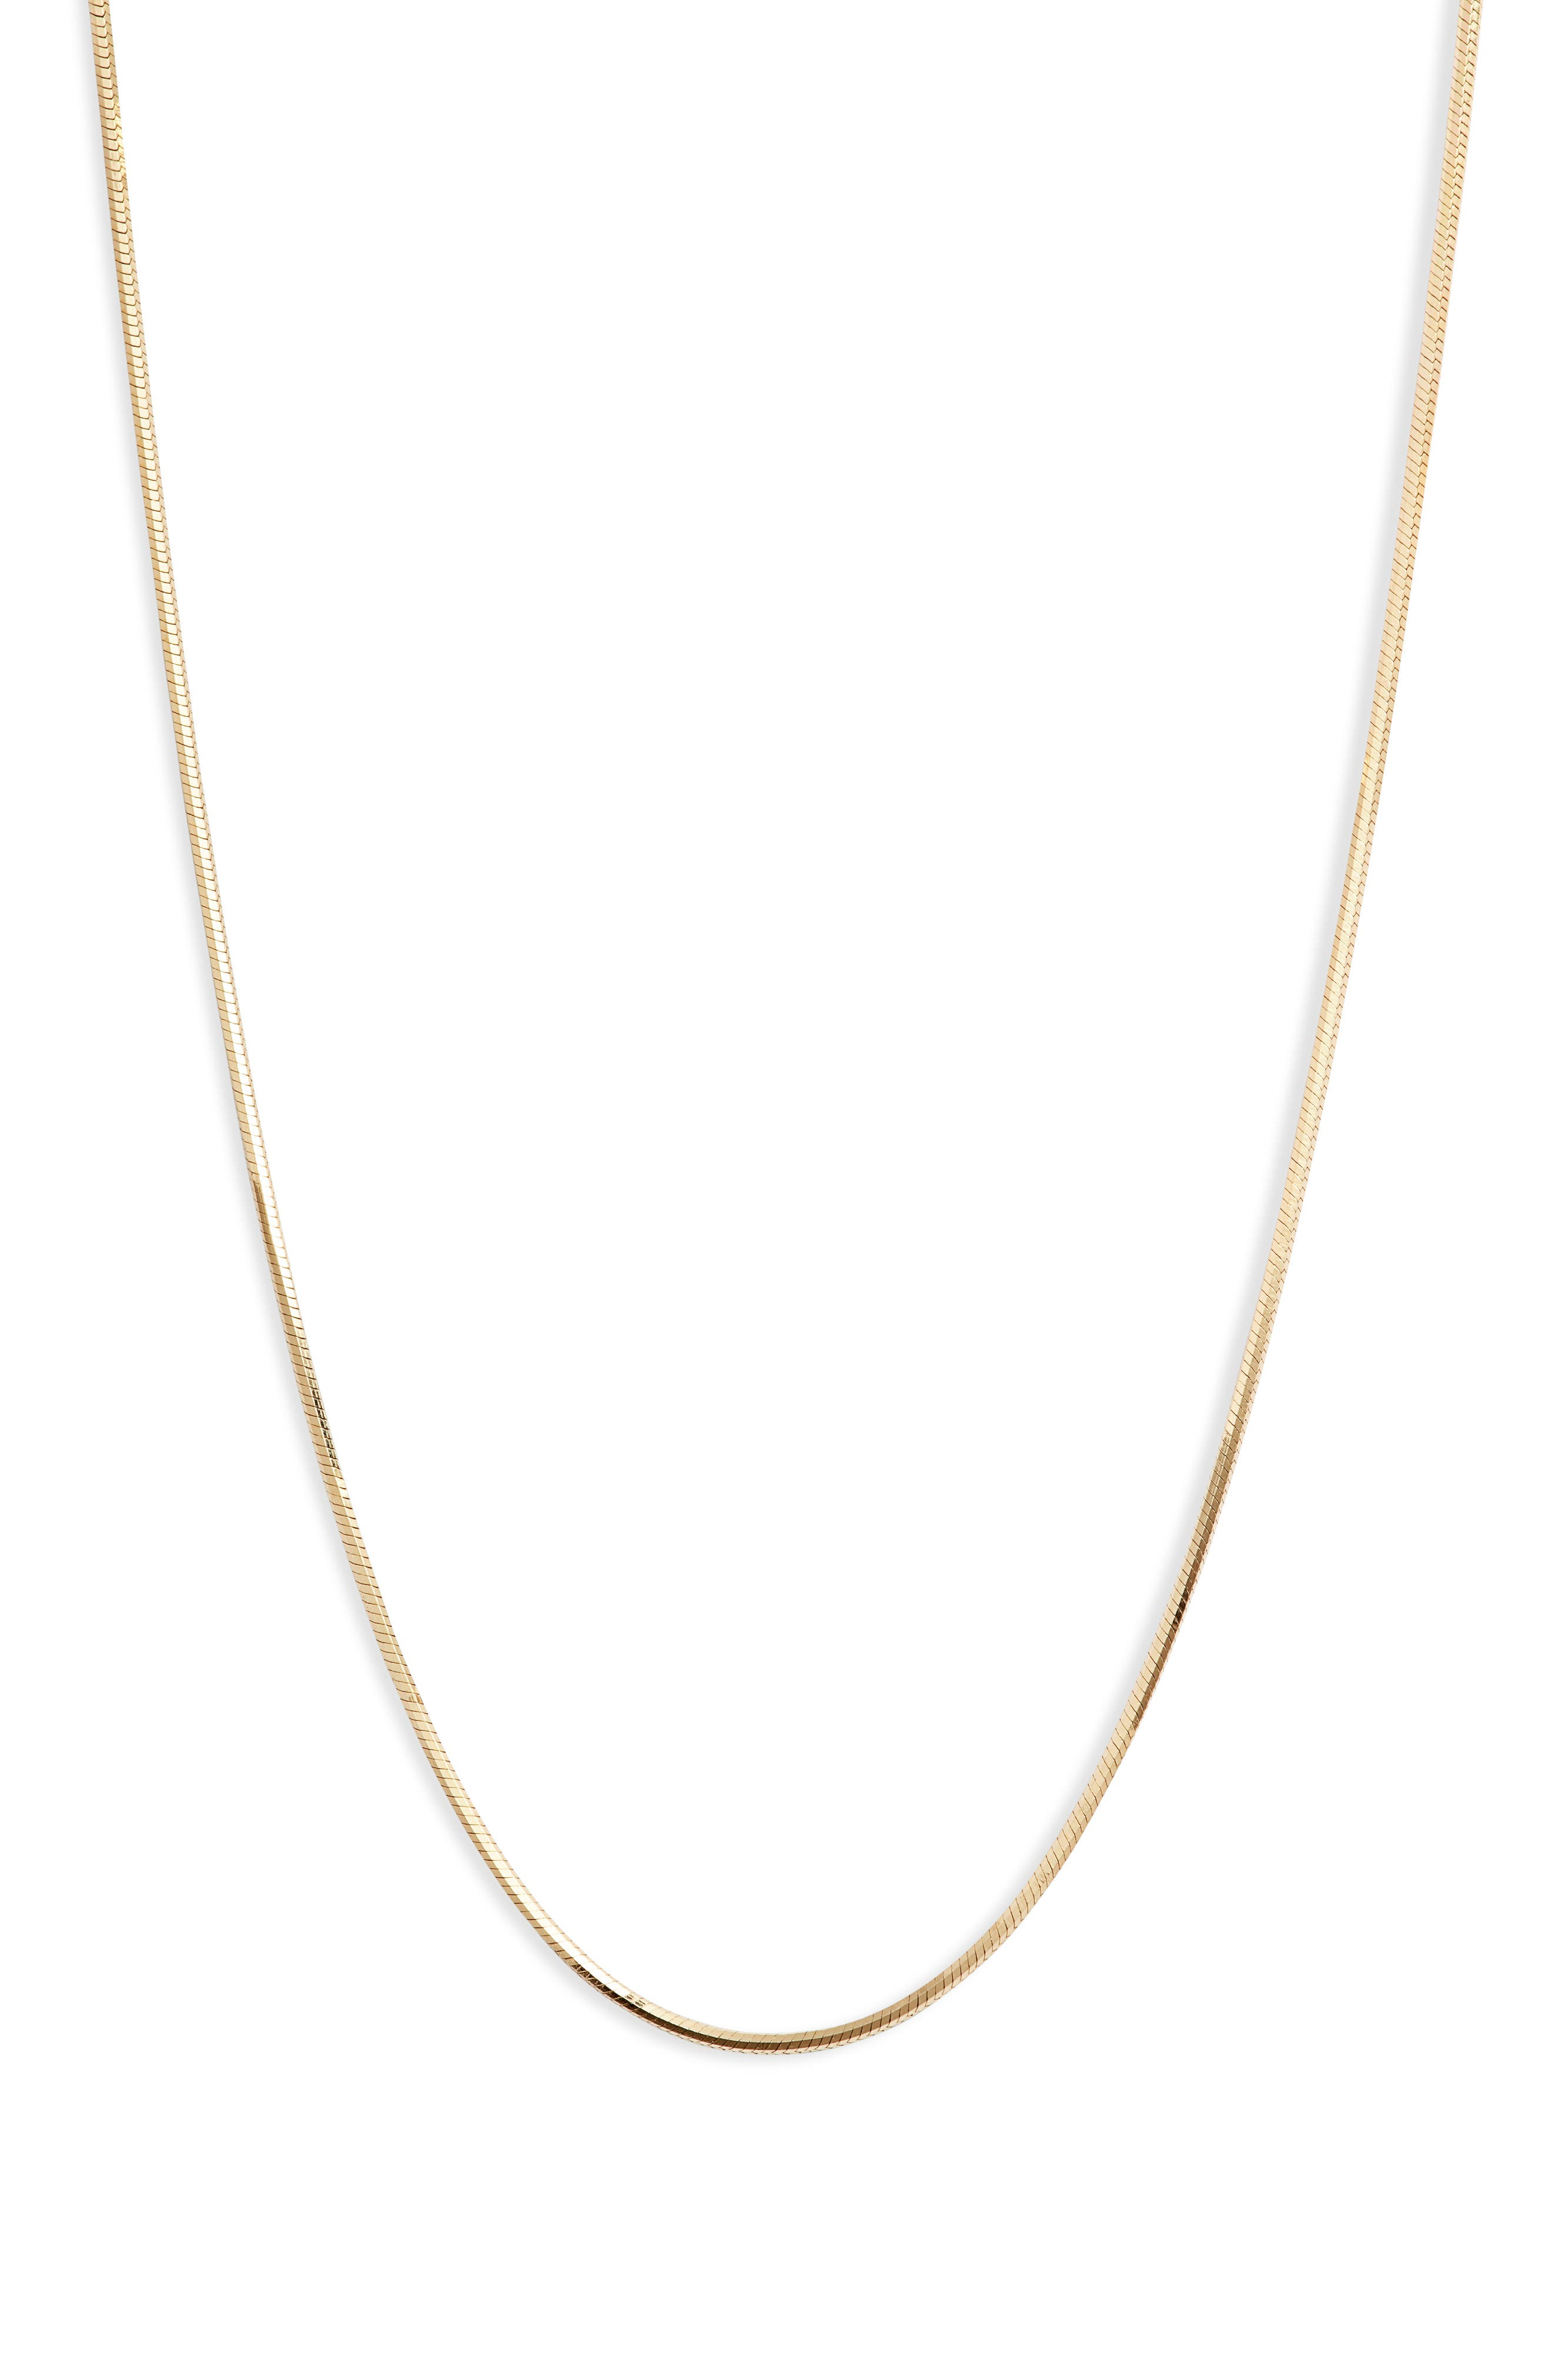 Women's Argento Vivo Tuscany Chain Necklace